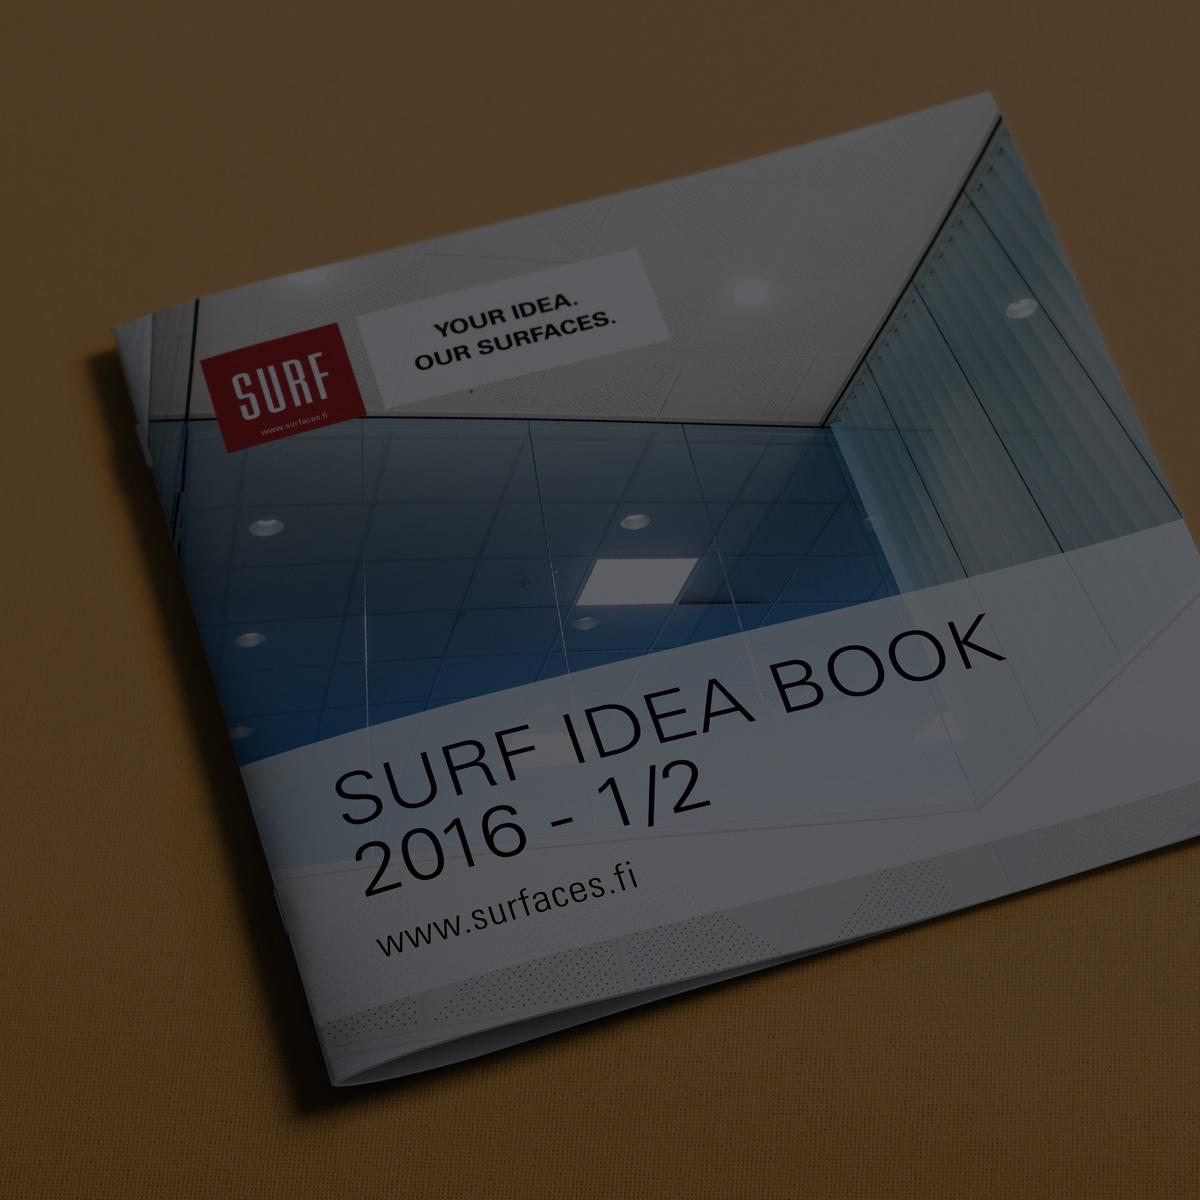 surf-landing-page-fi-2016-02-bg.jpg